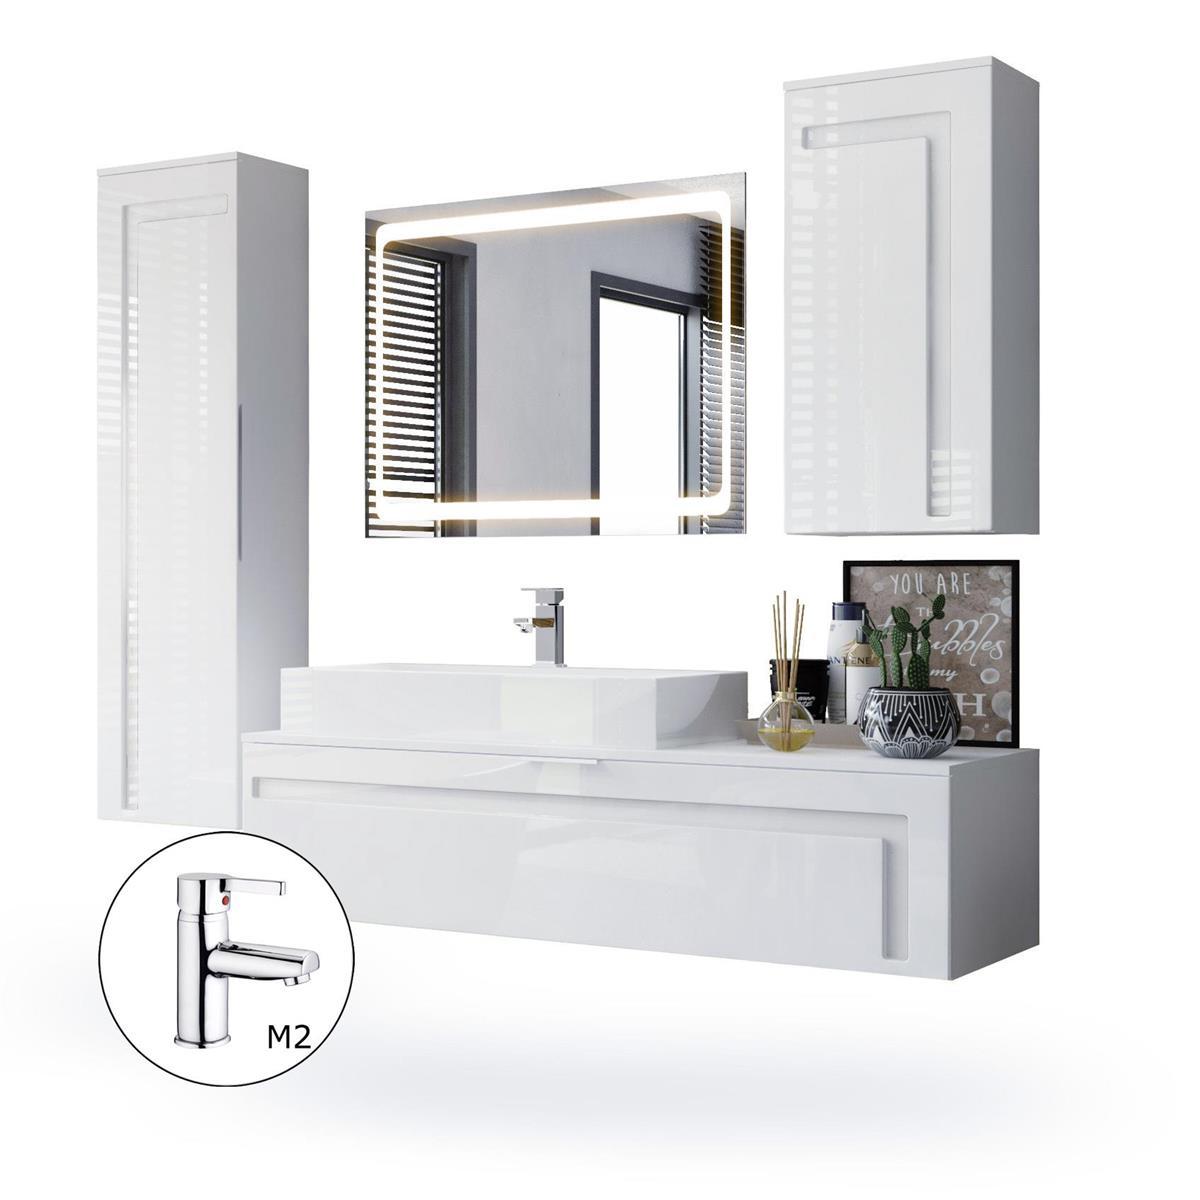 Details zu Badmöbel Komplett Set Weiß Badezimmer Spiegel LED Beleuchtung  Hochglanz Aloha